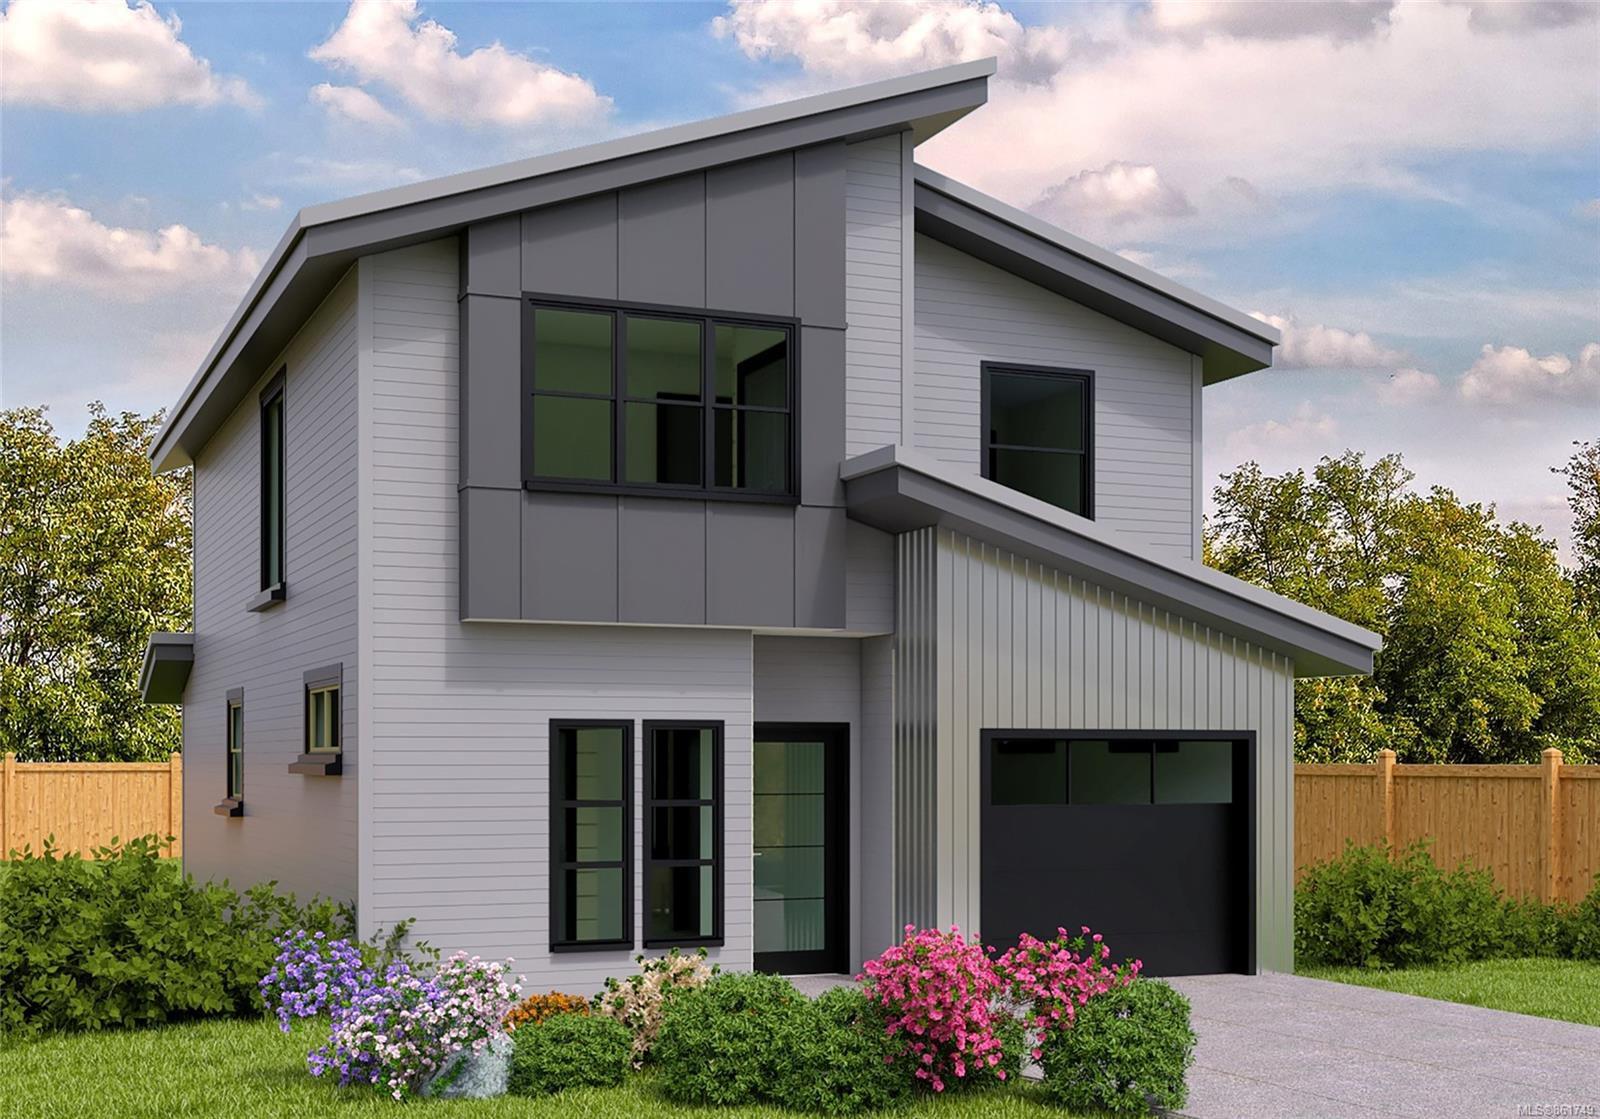 Main Photo: 134 1051 Shawnigan Lake Rd in : ML Shawnigan House for sale (Malahat & Area)  : MLS®# 861749